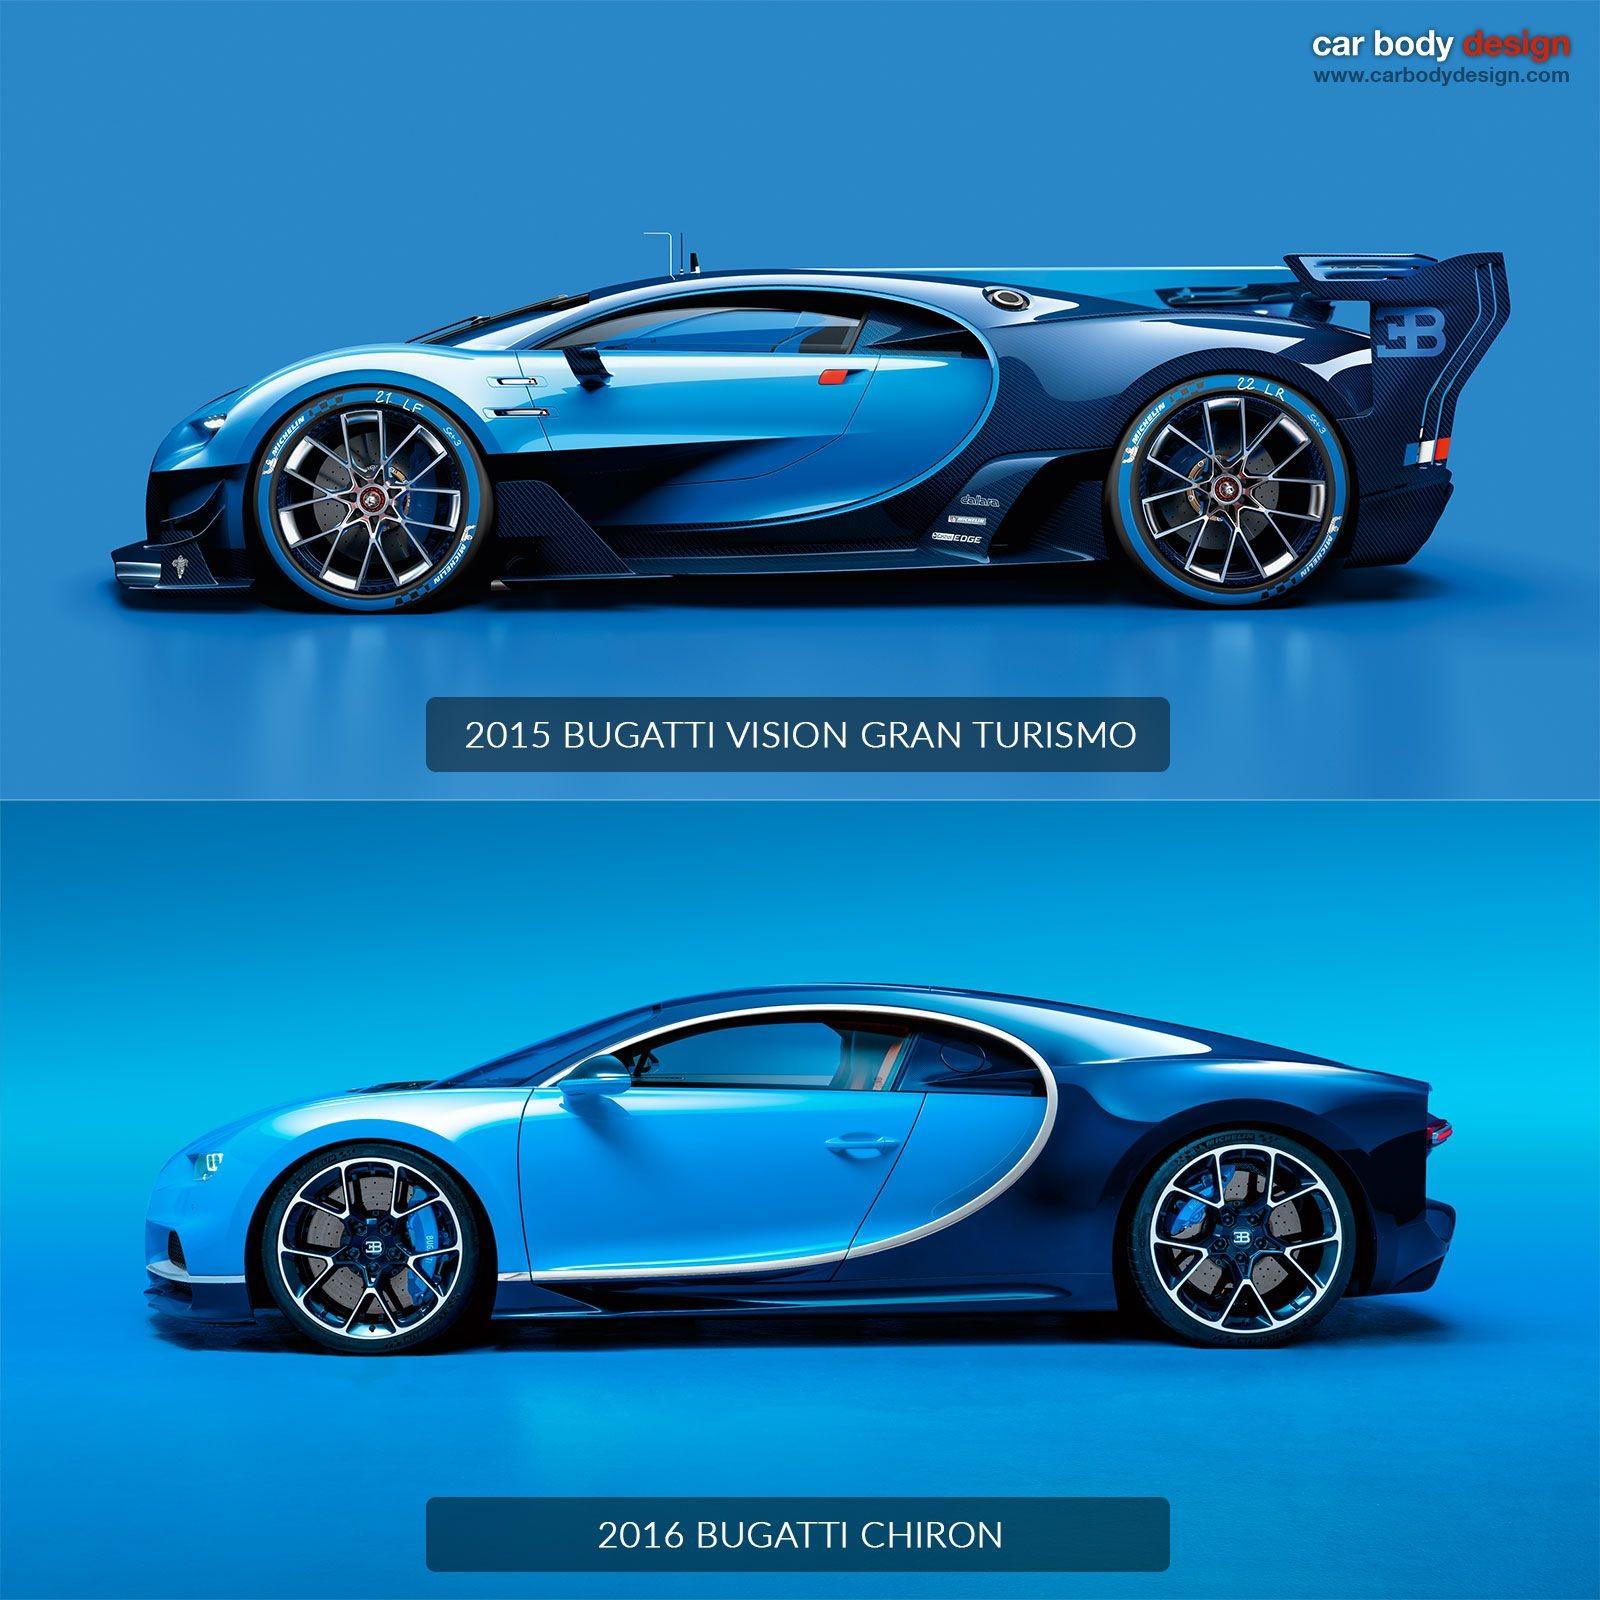 Bugatti Veyron Engine Diagram the Bugatti Eb110 Of Bugatti Veyron Engine Diagram